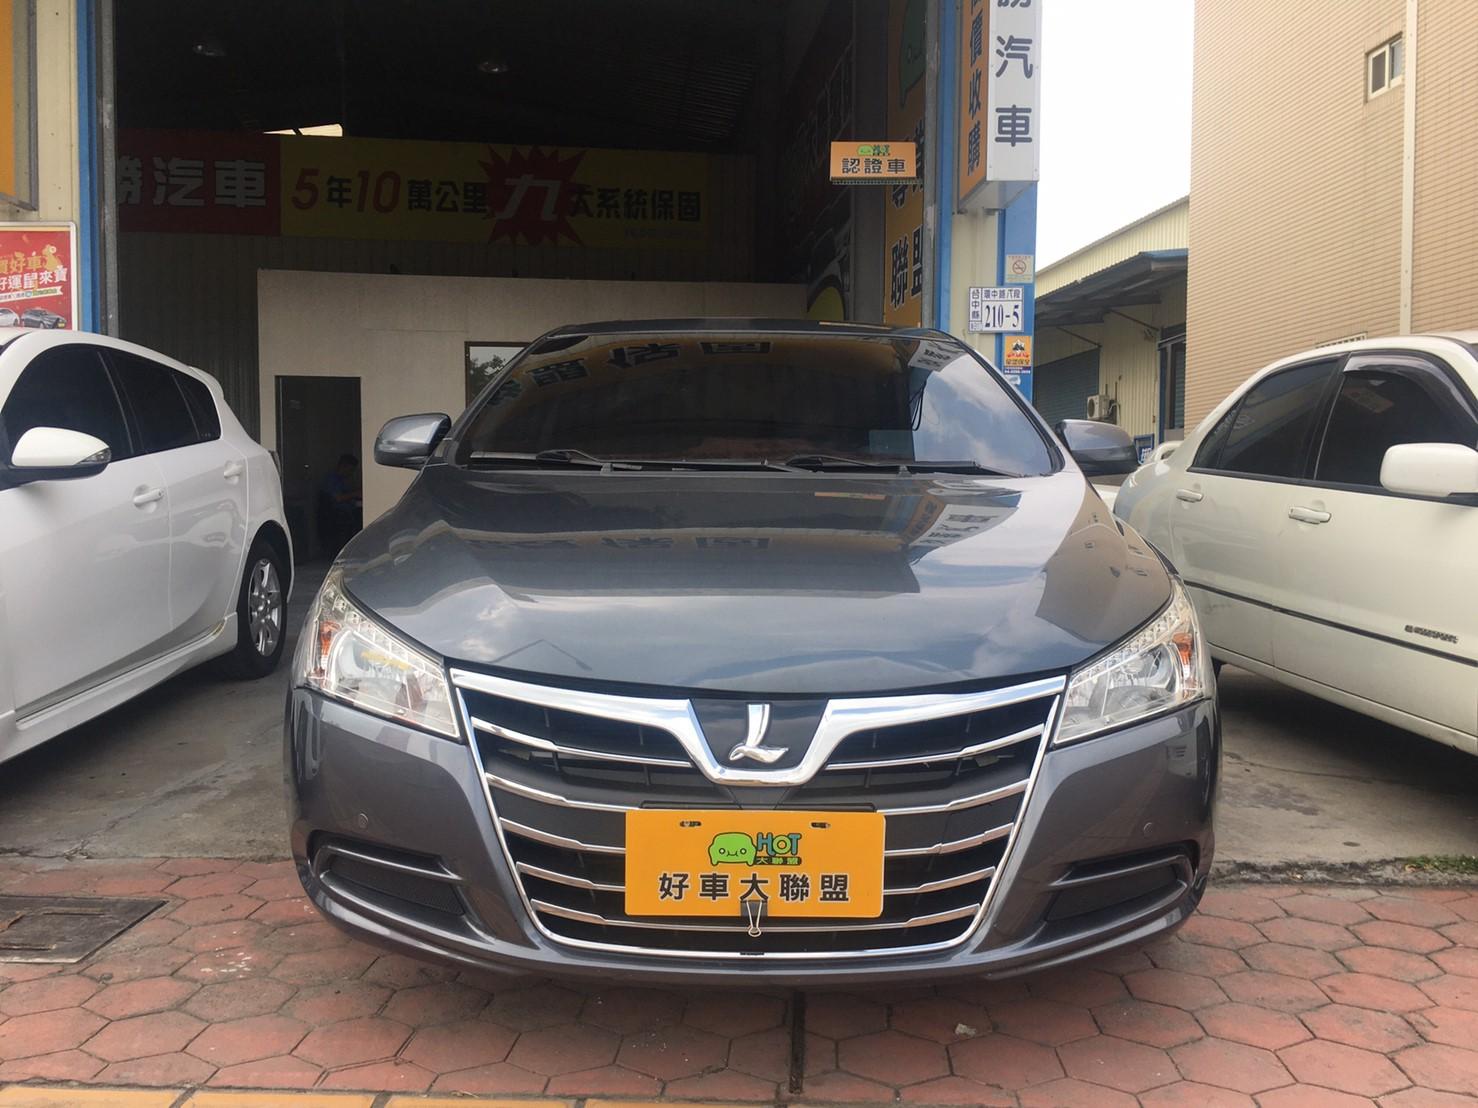 2015 Luxgen 納智捷 S5 turbo